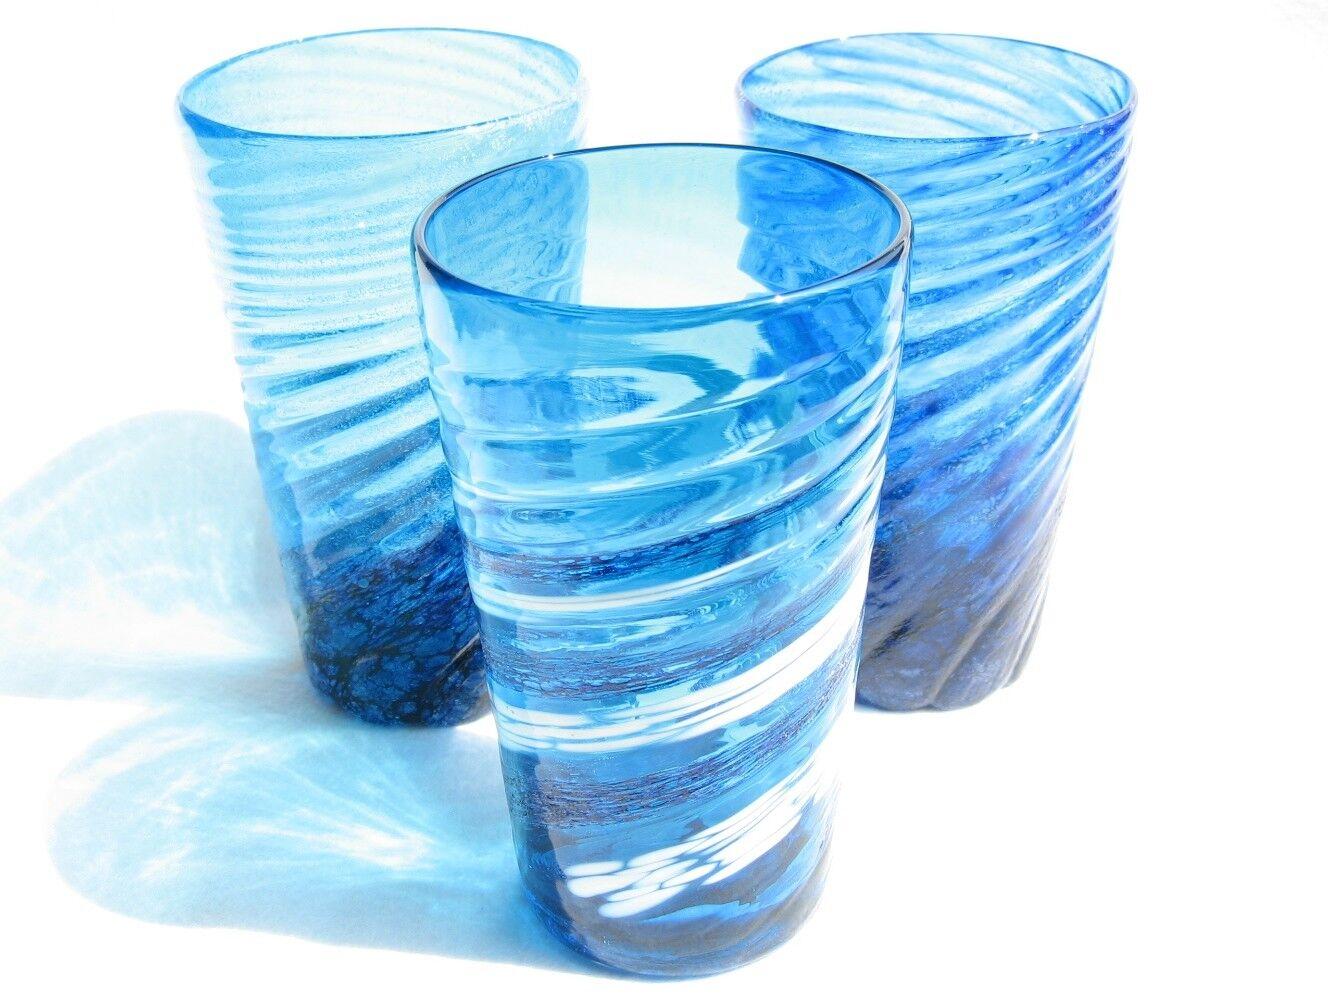 Set of 3 Cobalt Glass Tumblers  Deep Blau, Water Blau, Swirling Weiß Bubbles